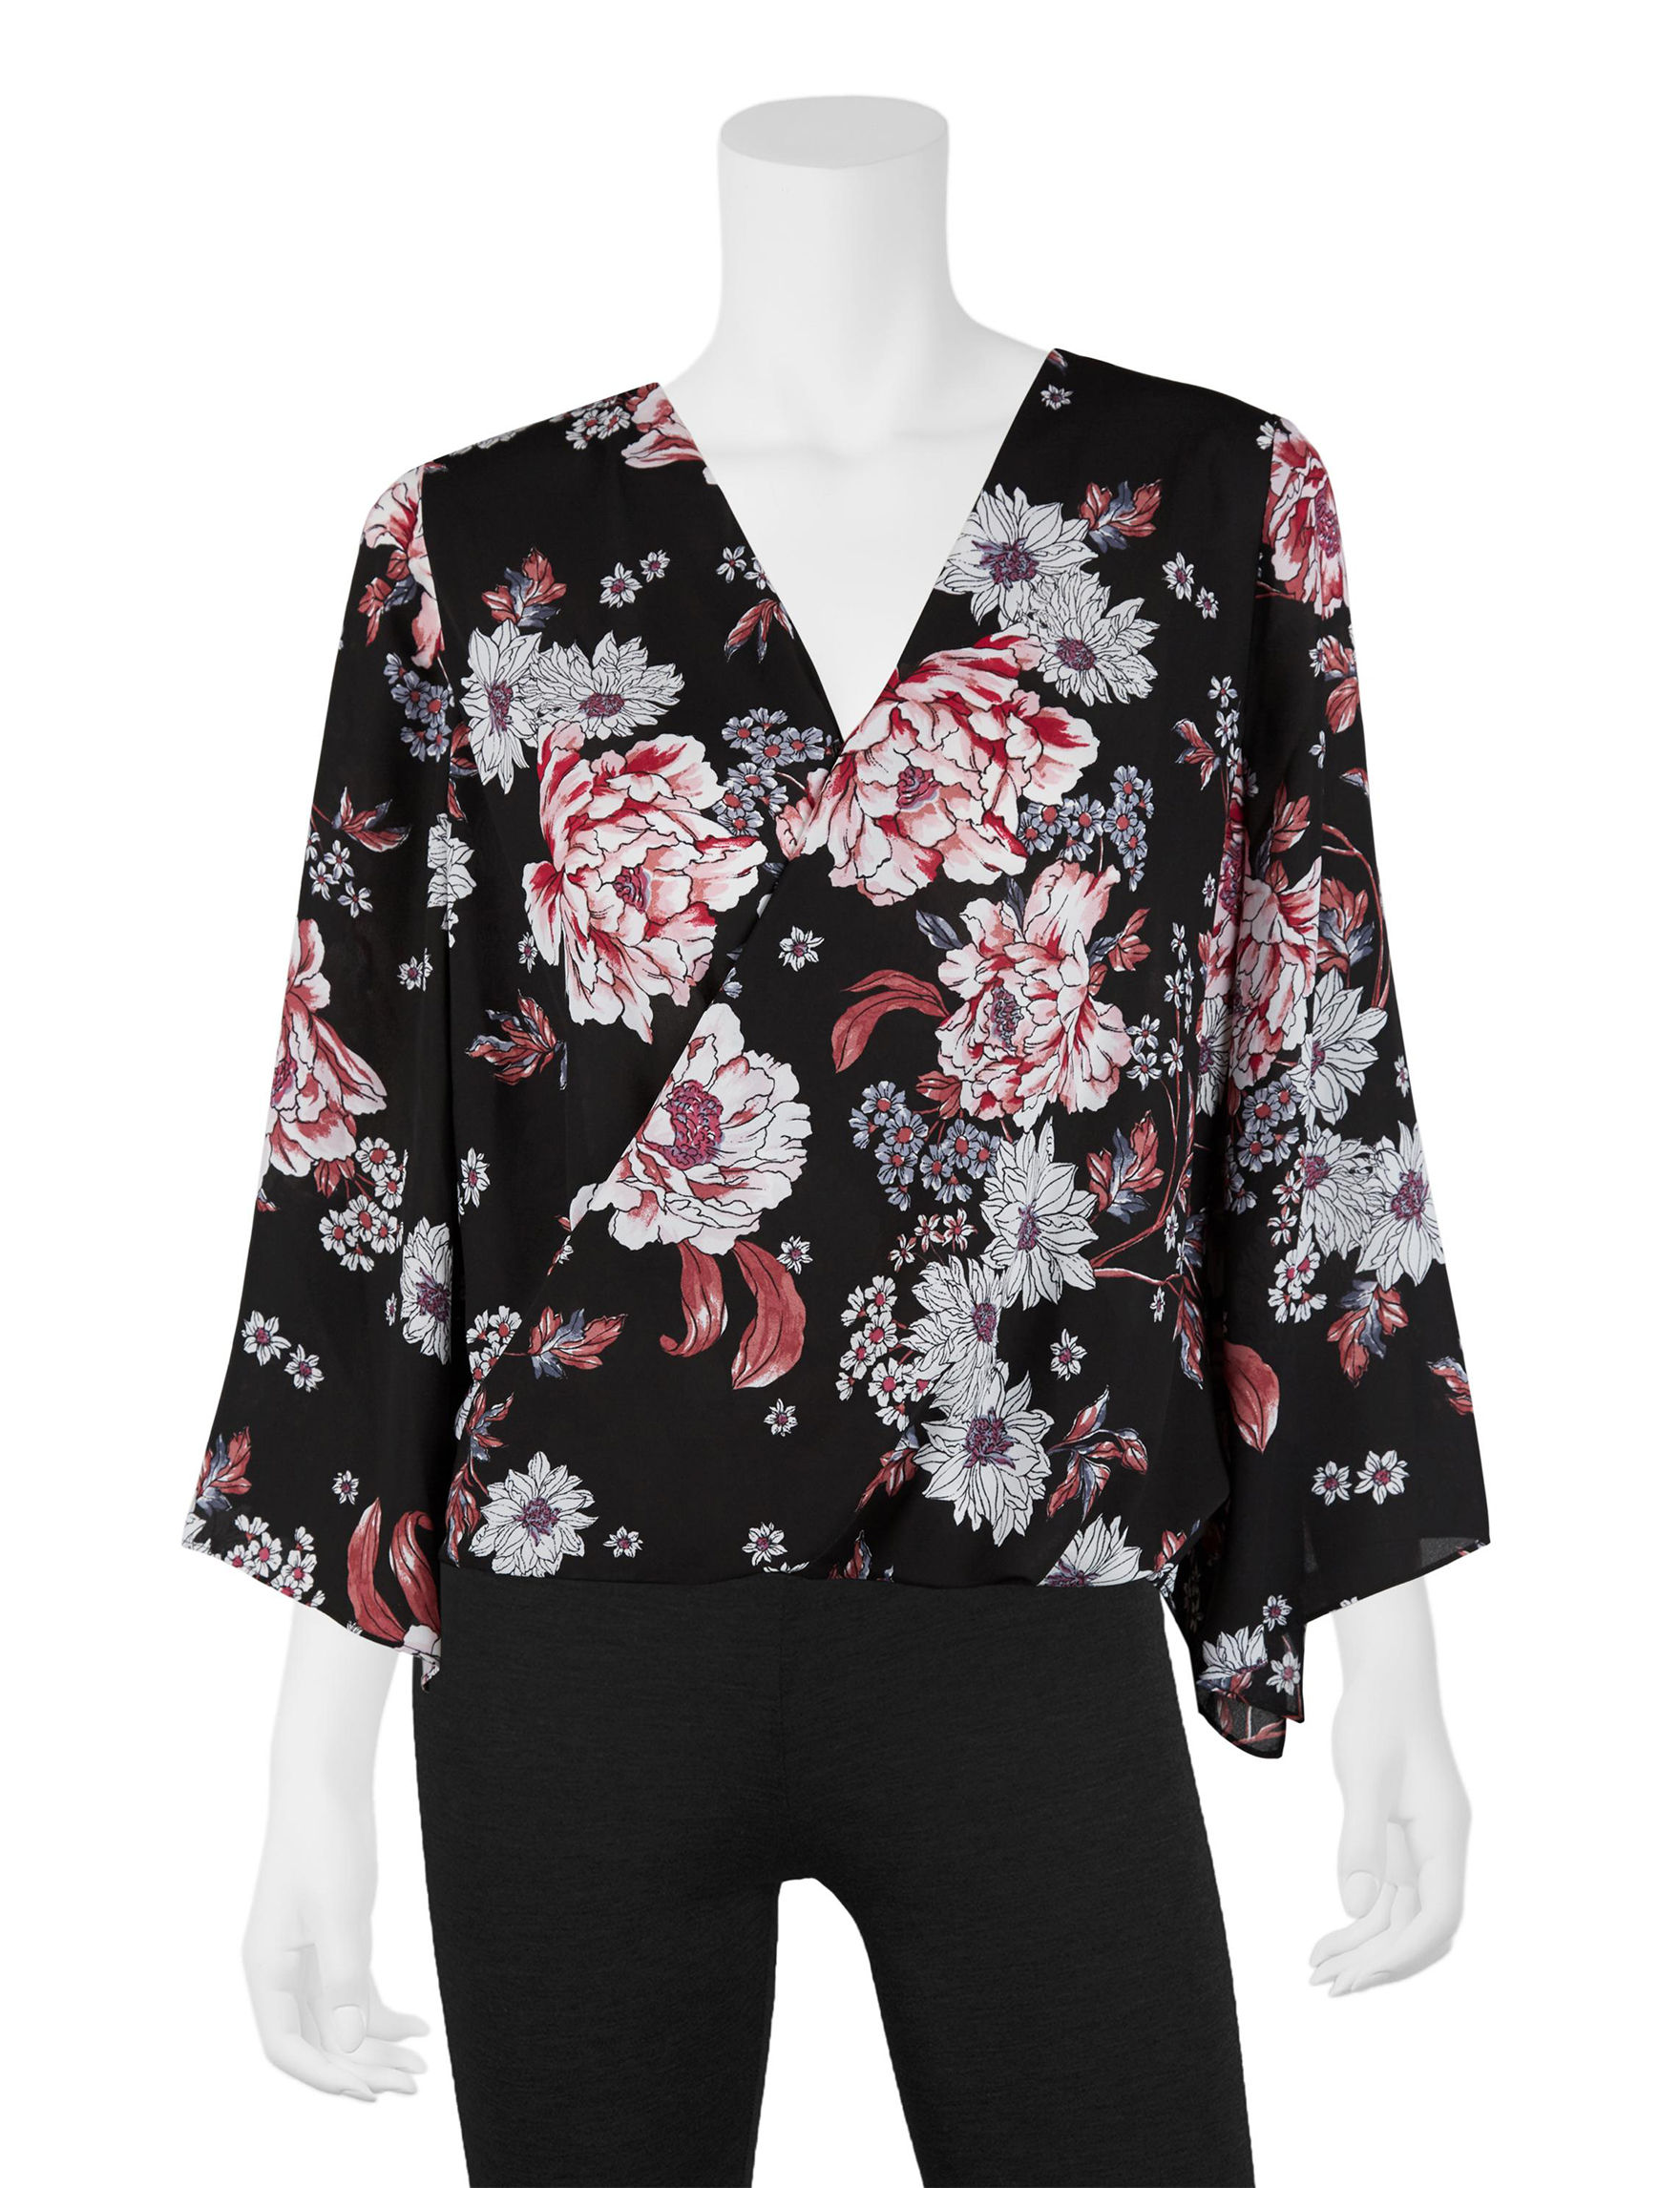 A. Byer Black Floral Shirts & Blouses